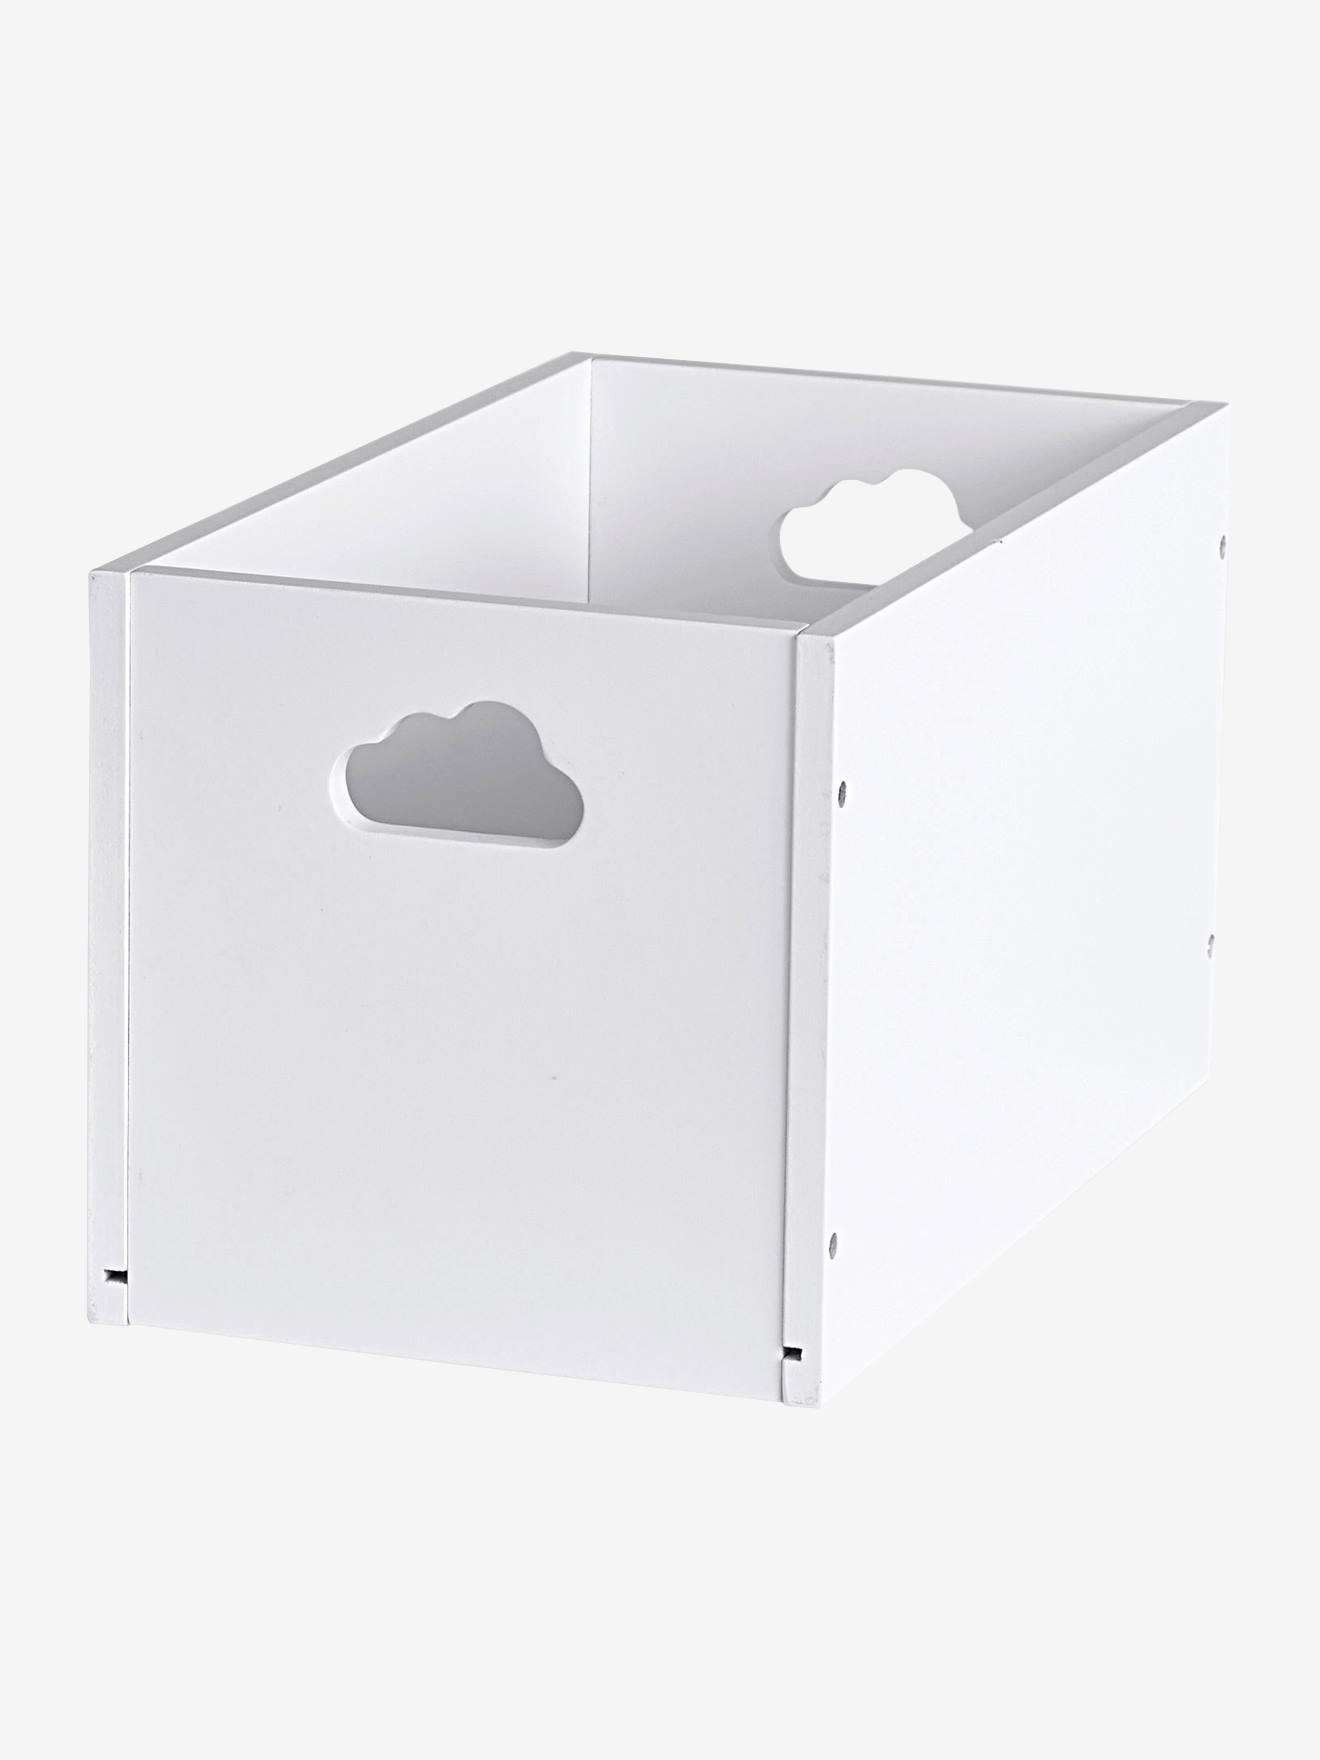 Caja de almacenaje de madera pintada blanco vertbaudet - Caja de almacenaje ...